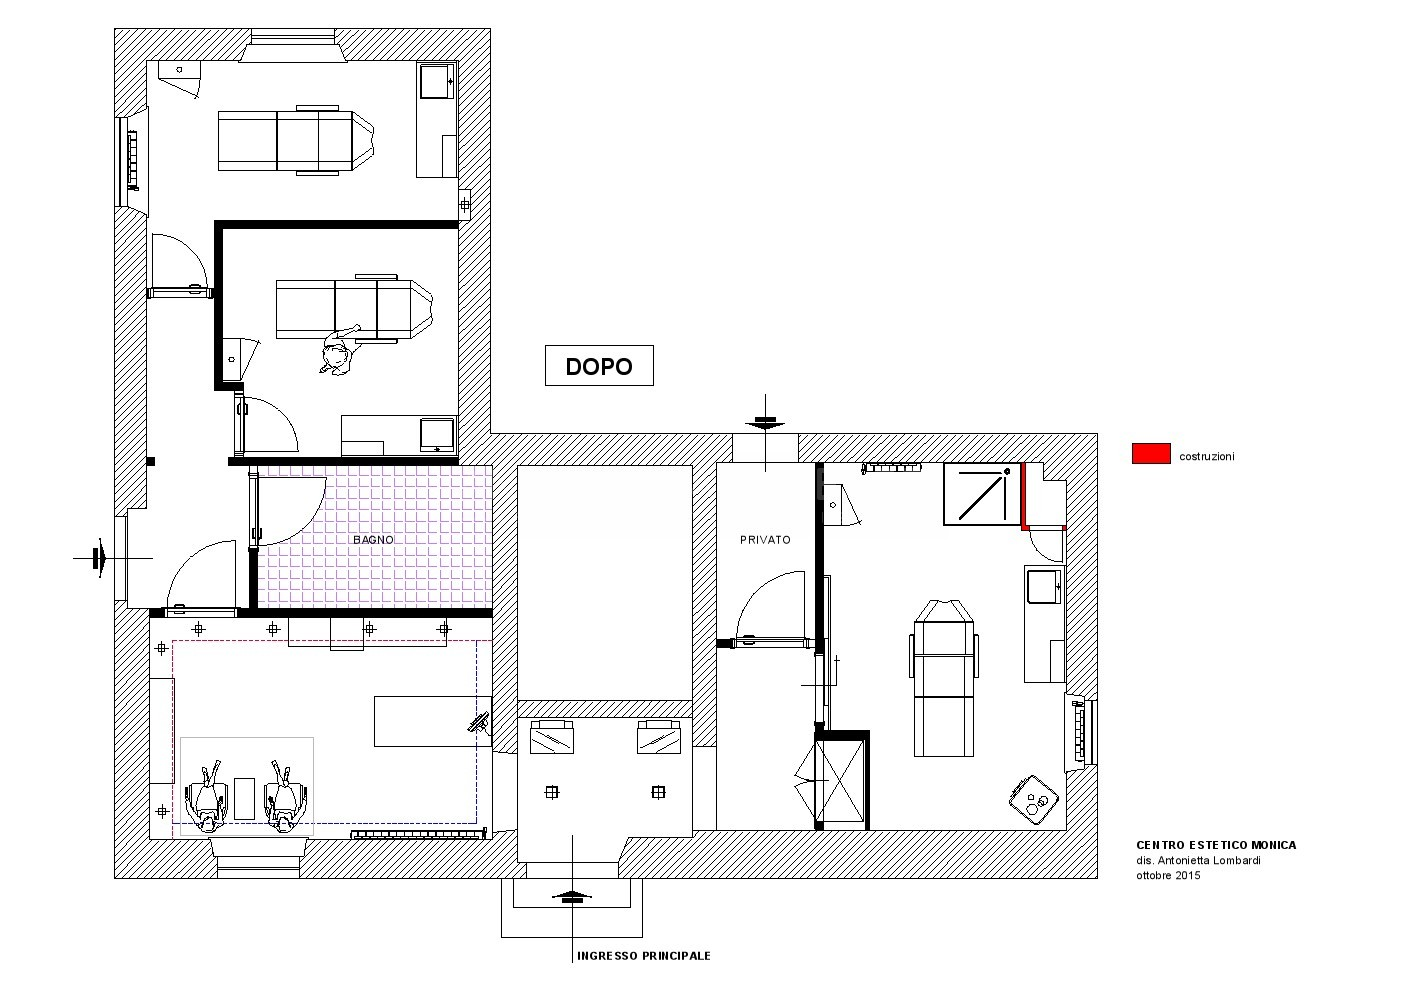 antonietta-lombardi-ingresso-reception-dopo-centro-estetico-02